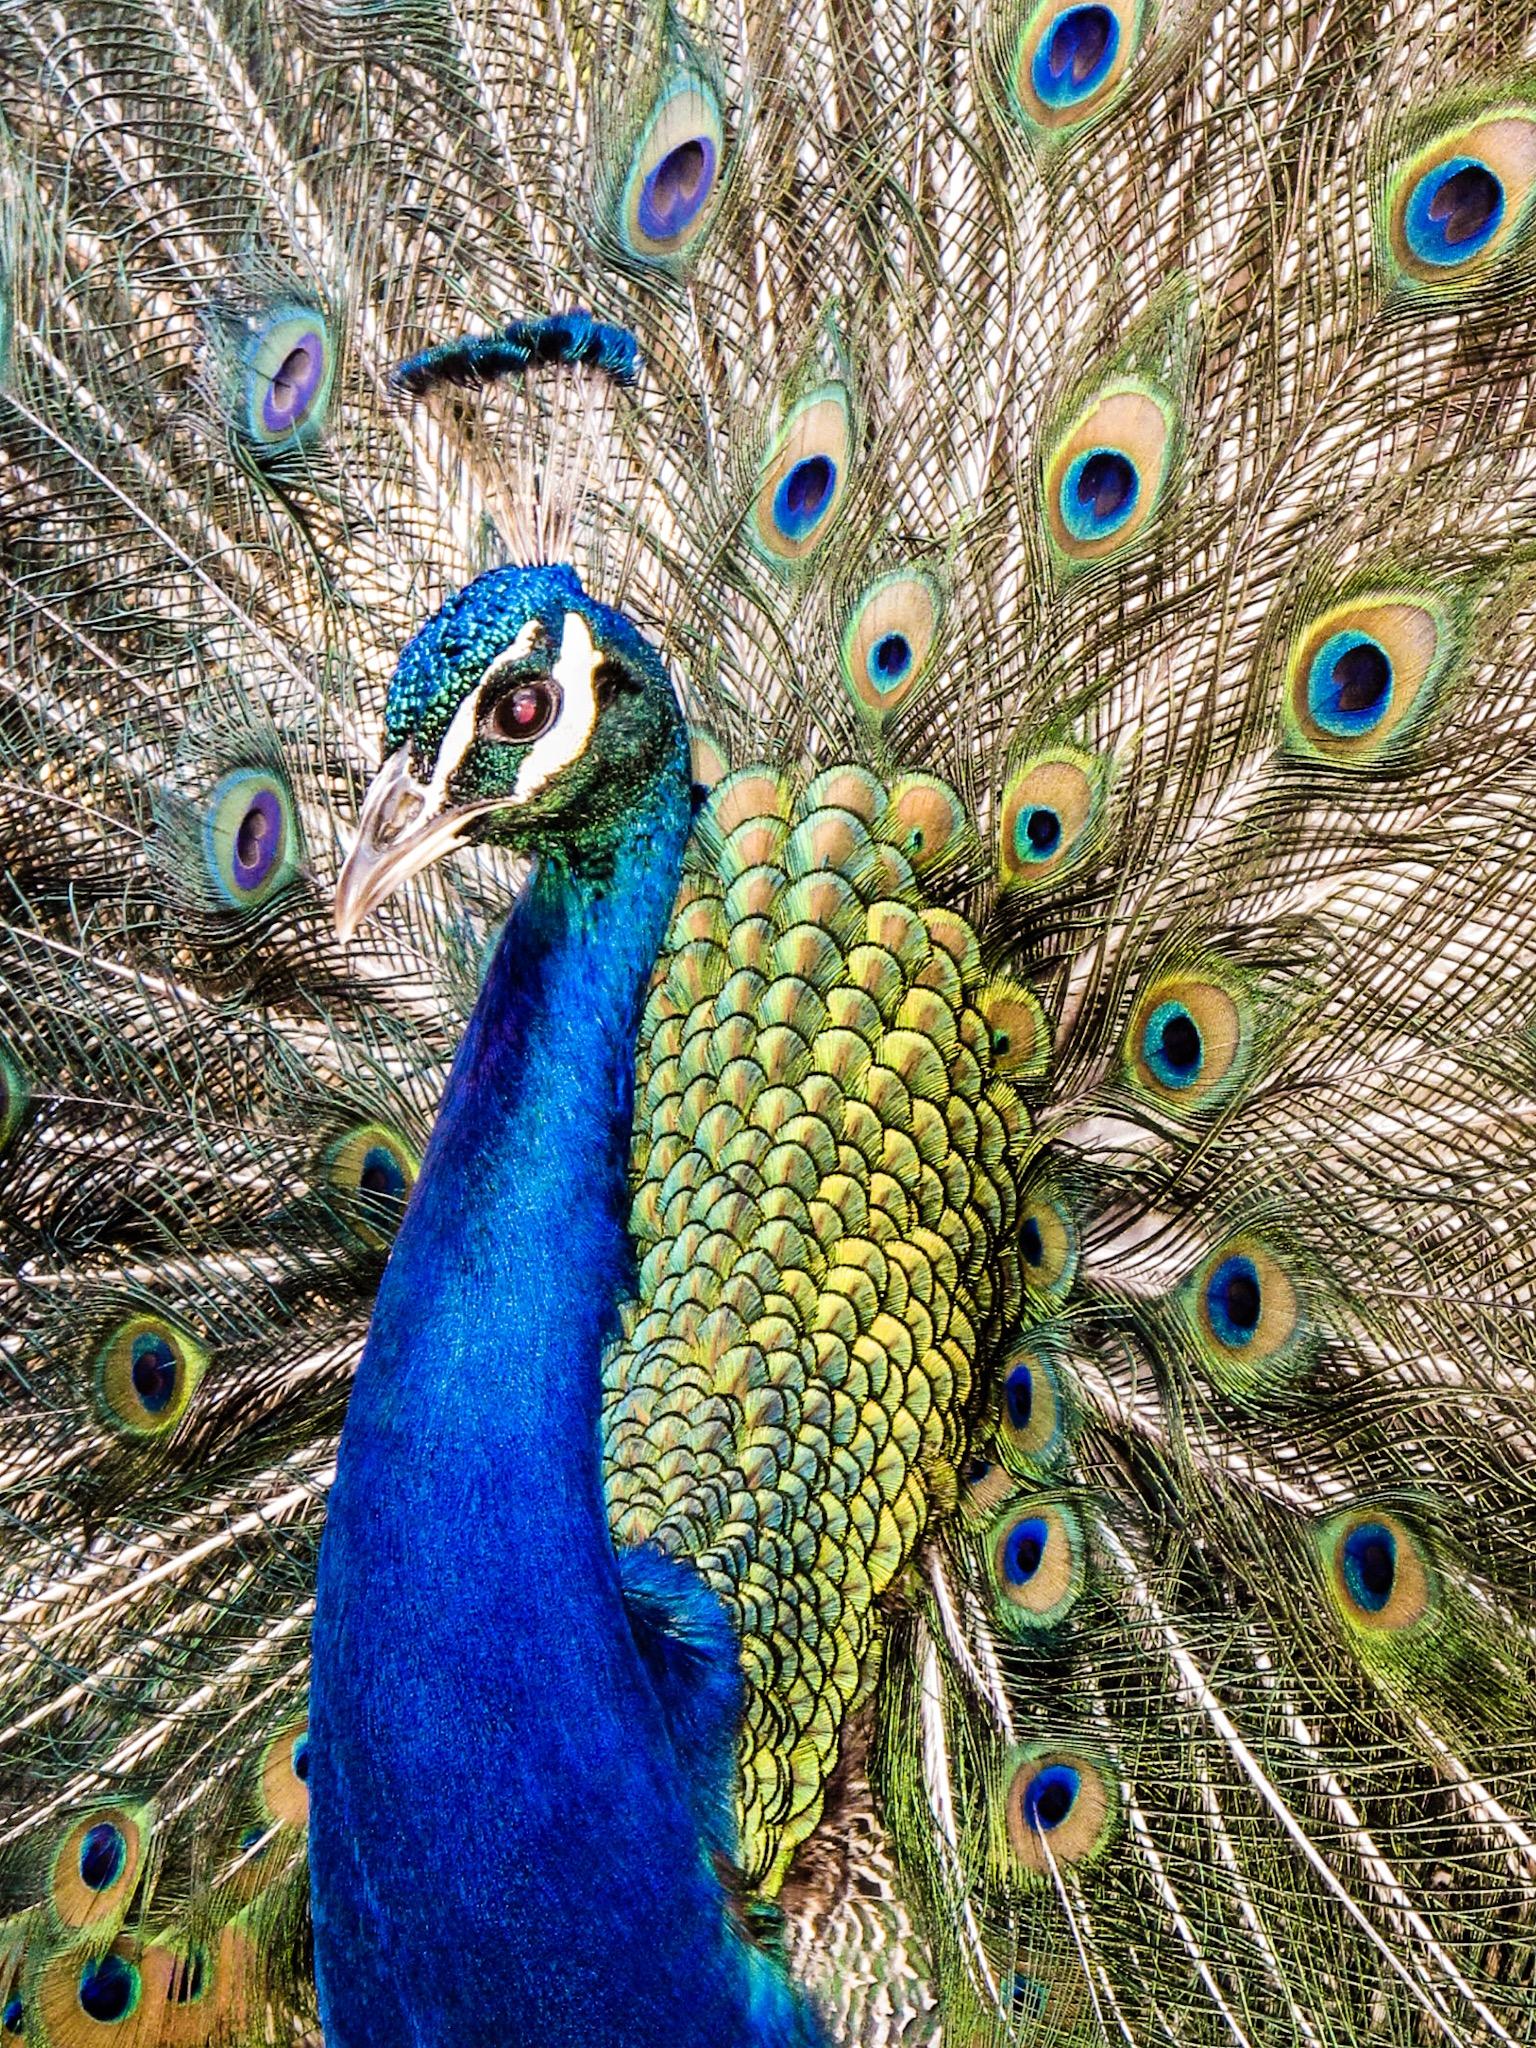 Peacock on Brownsea Island by Poole Photographer Rick McEvoy